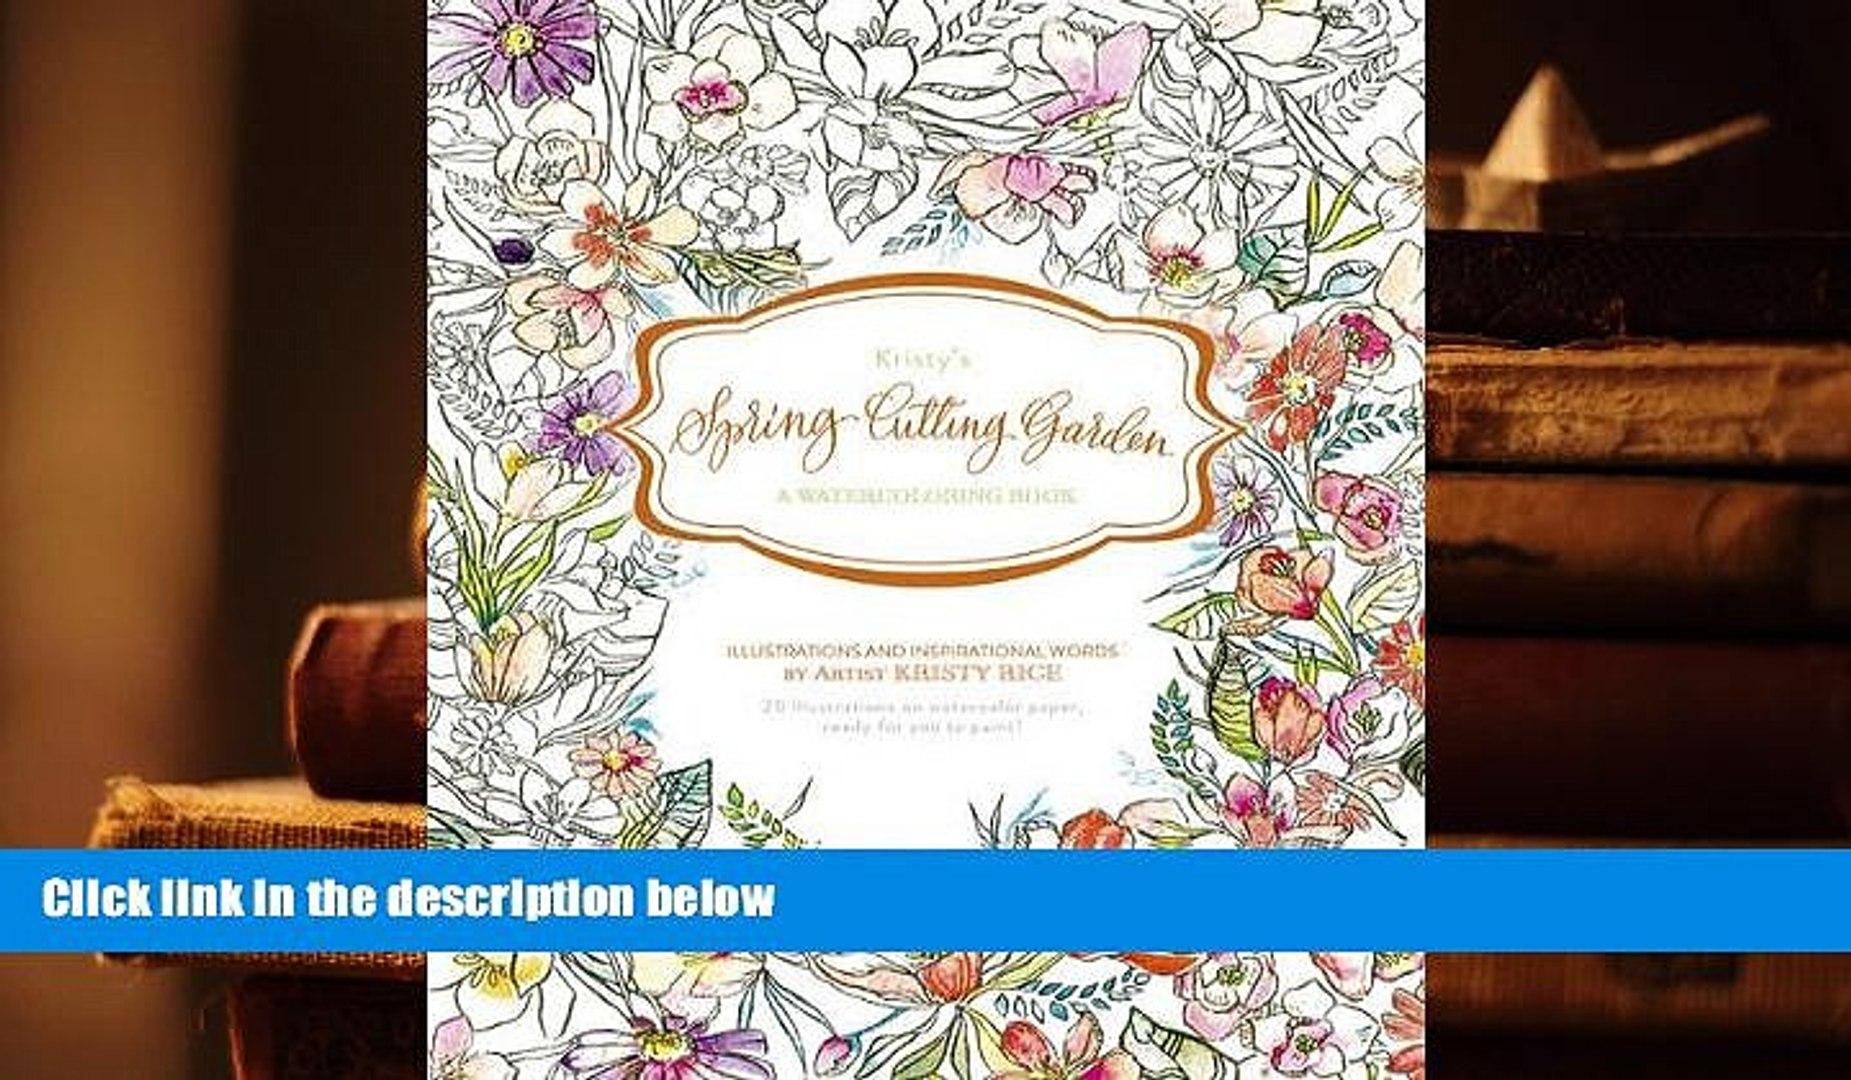 Audiobook  Kristy s Spring Cutting Garden: A Watercoloring Book (Kristy s Cutting Garden) For Ipad